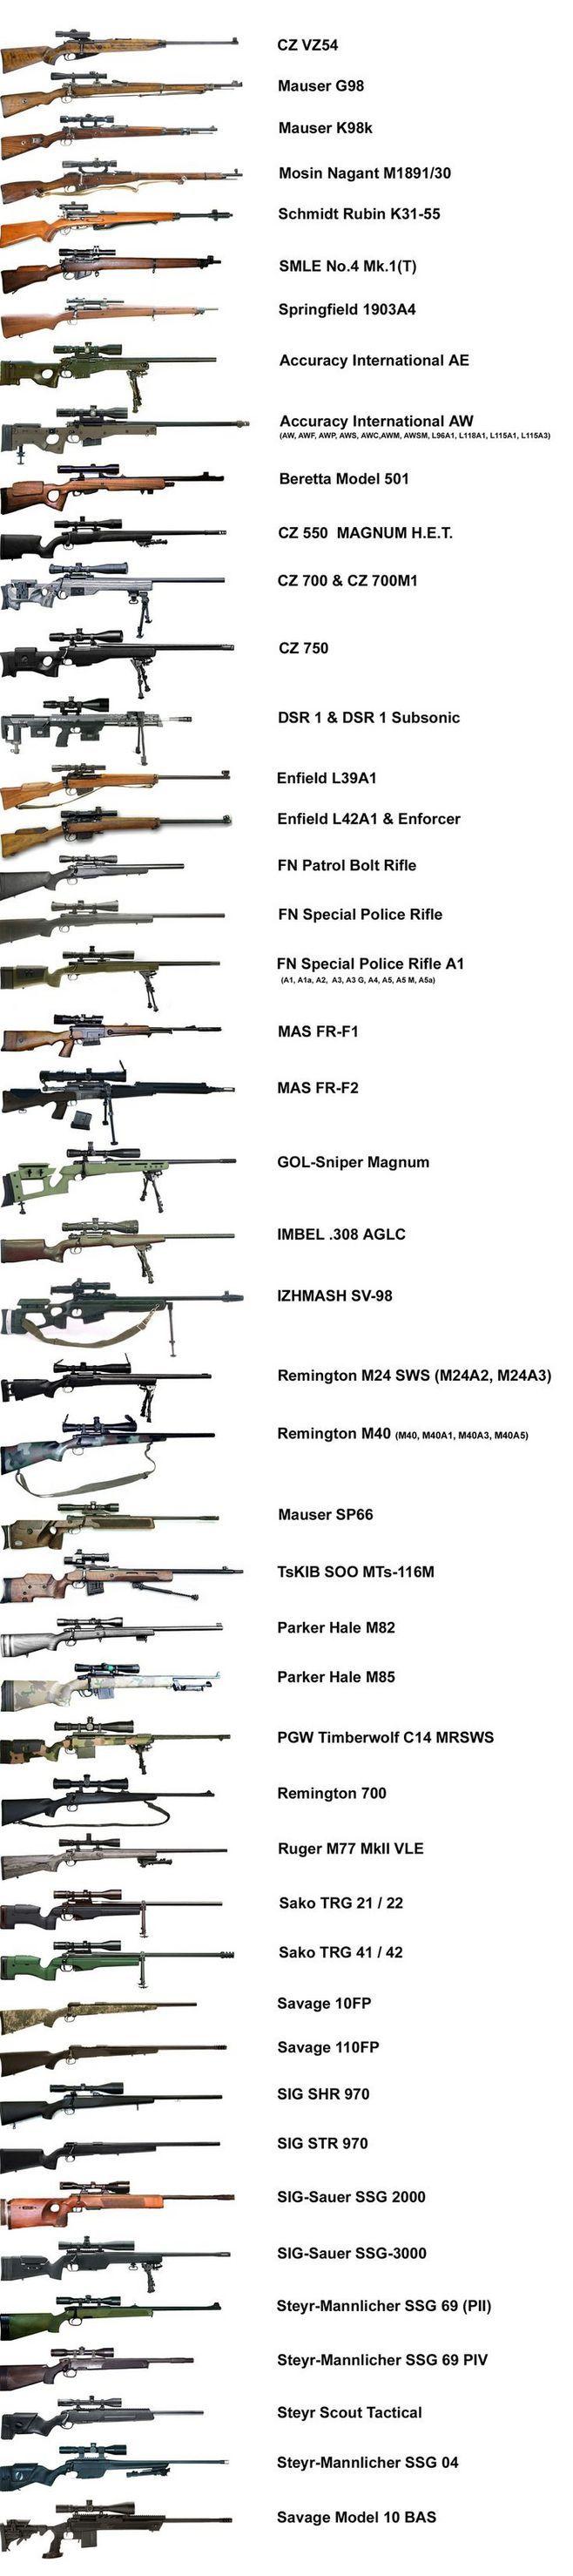 Sniper Rifles aka Ch...